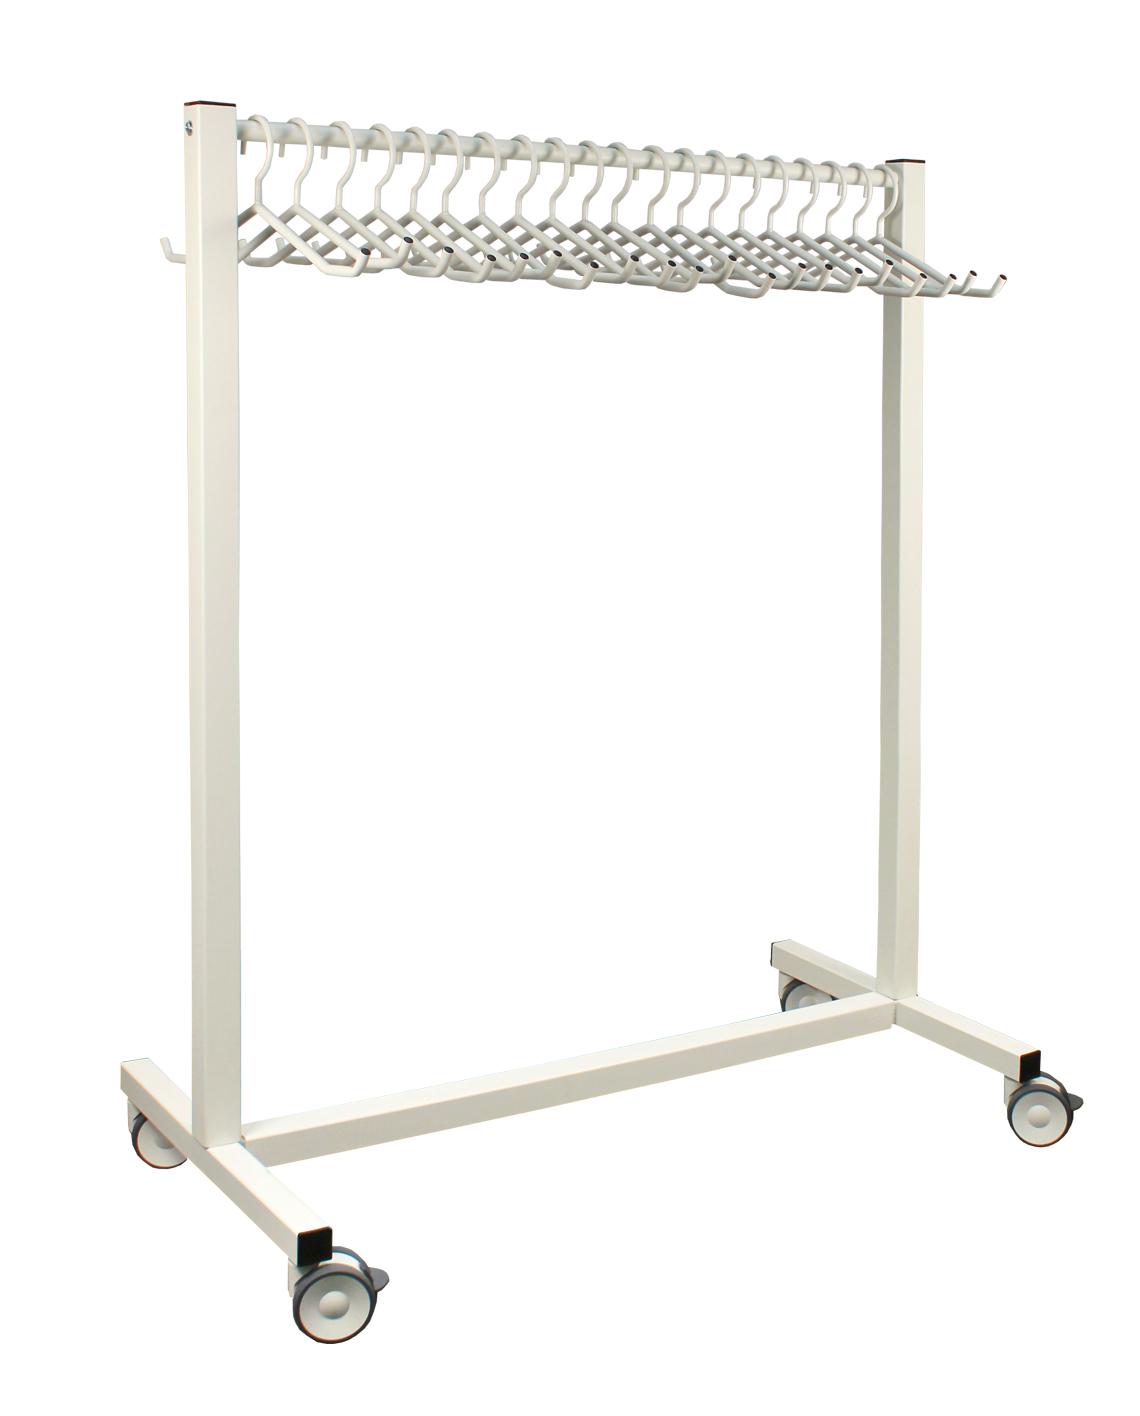 20 Hanger Apron Rack 683438